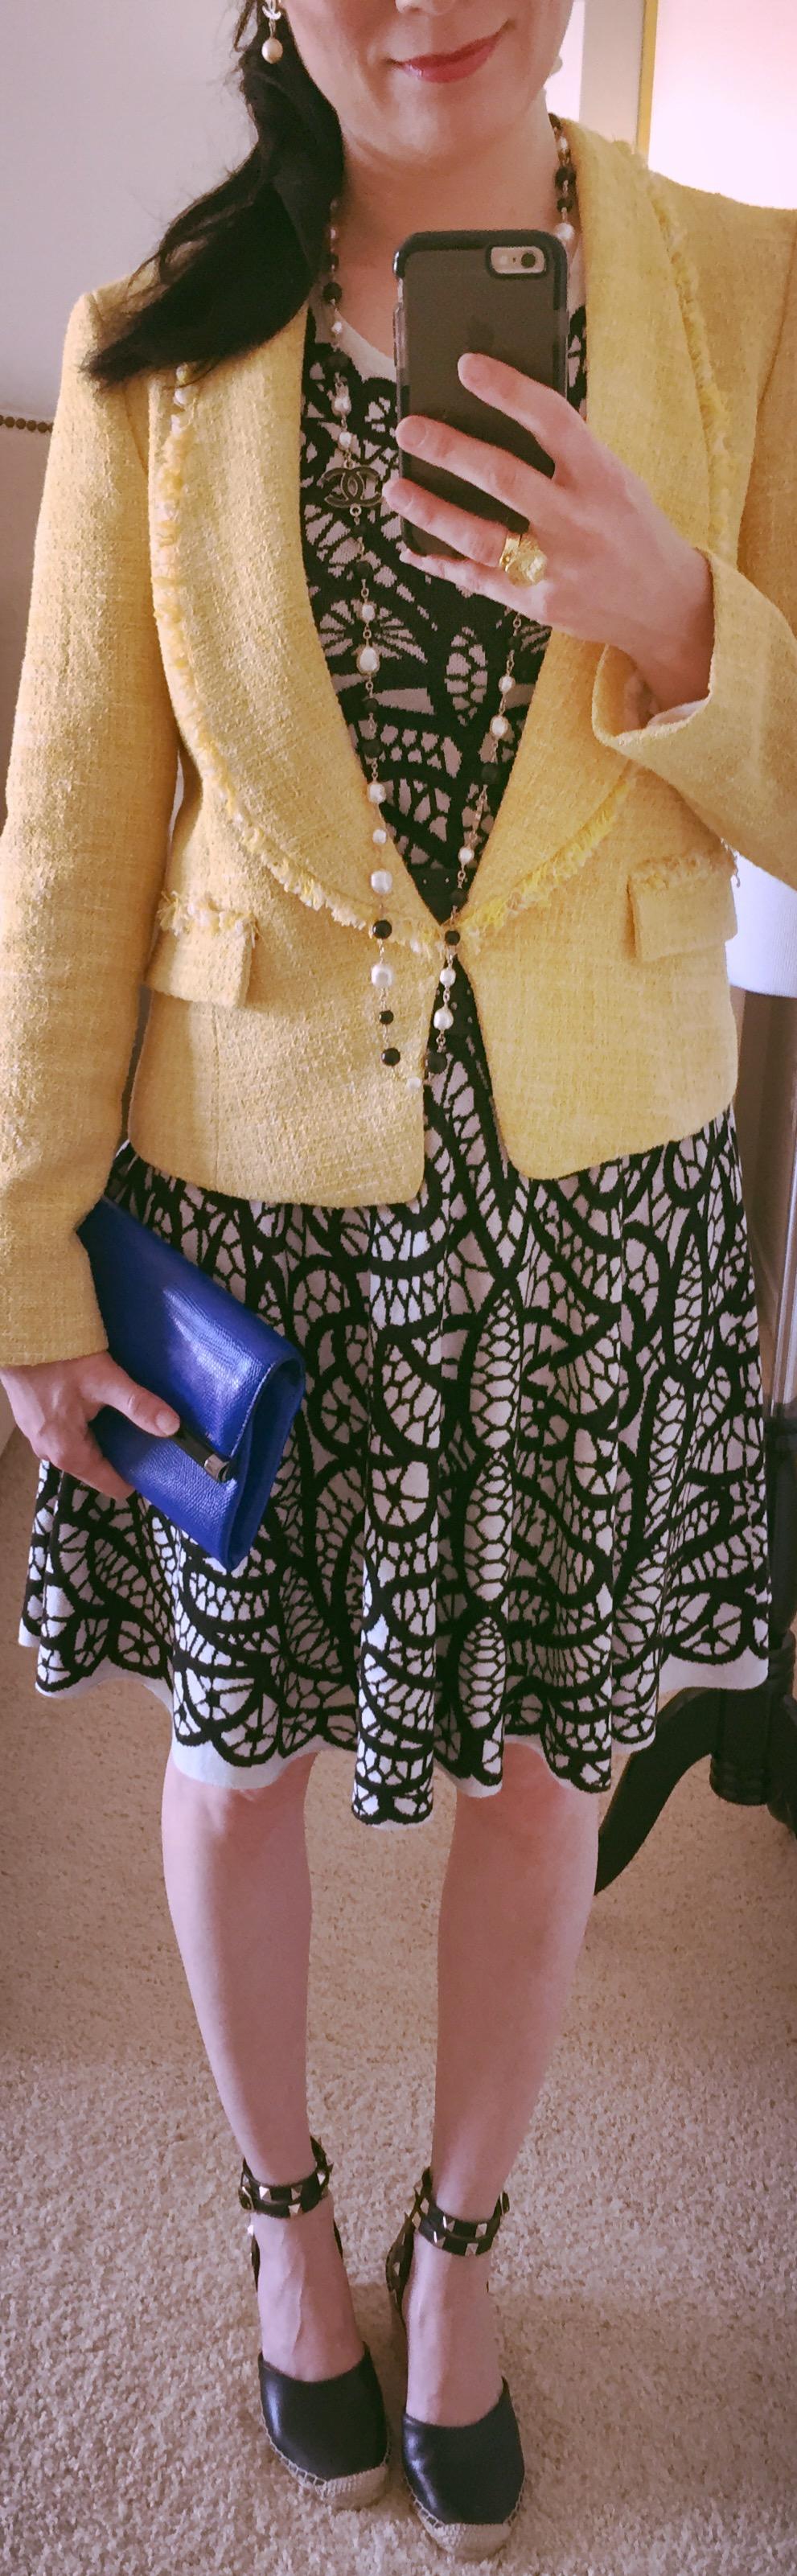 Wearing July 14, BCBG knit and woven blazer by Zara